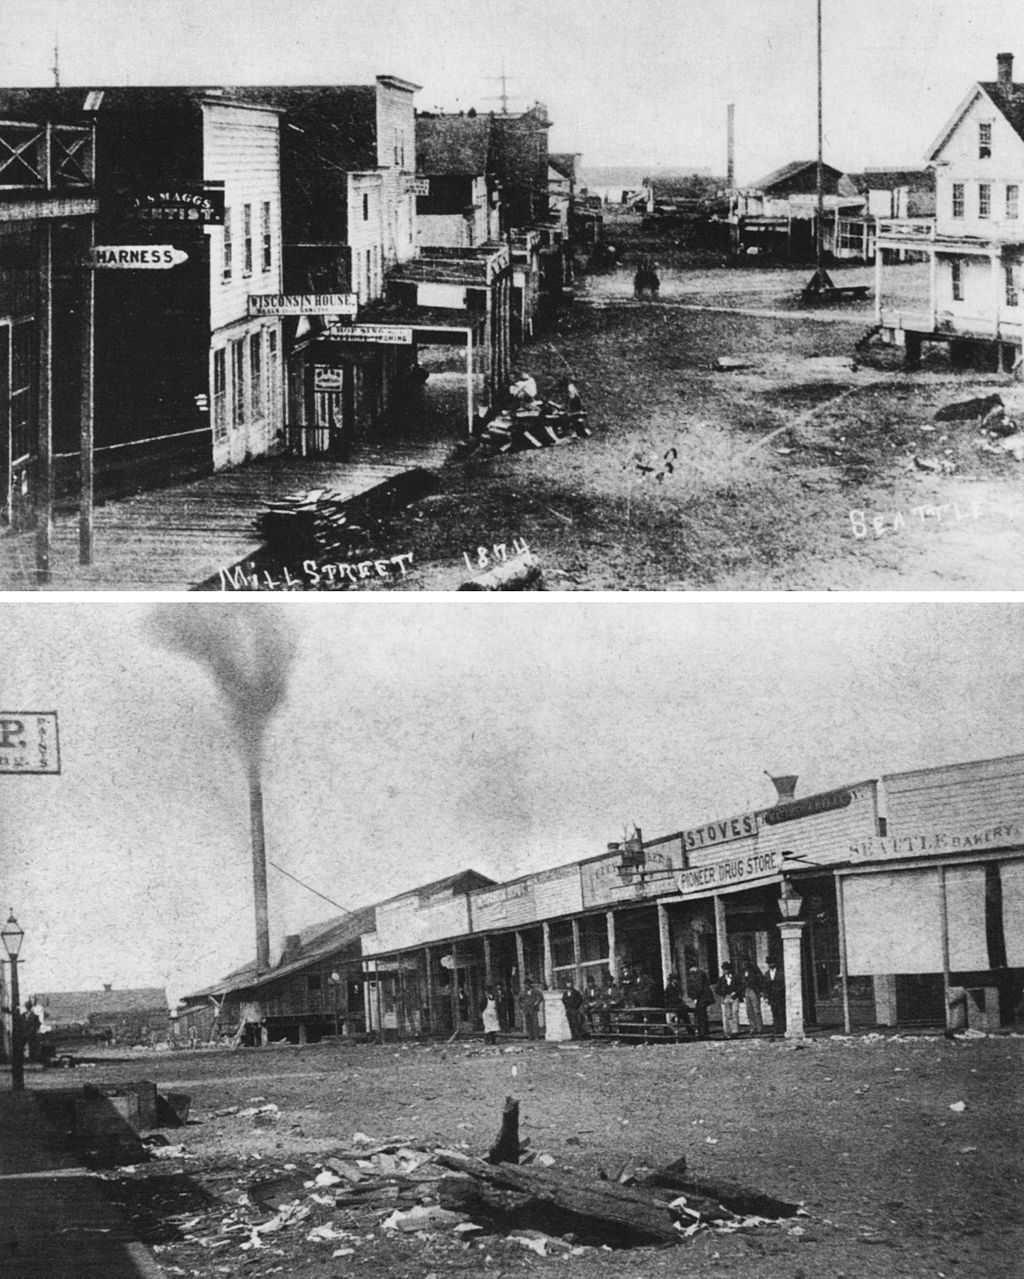 Original Skid Road Seattle 1874 Photo Skid Row Two Photos Of